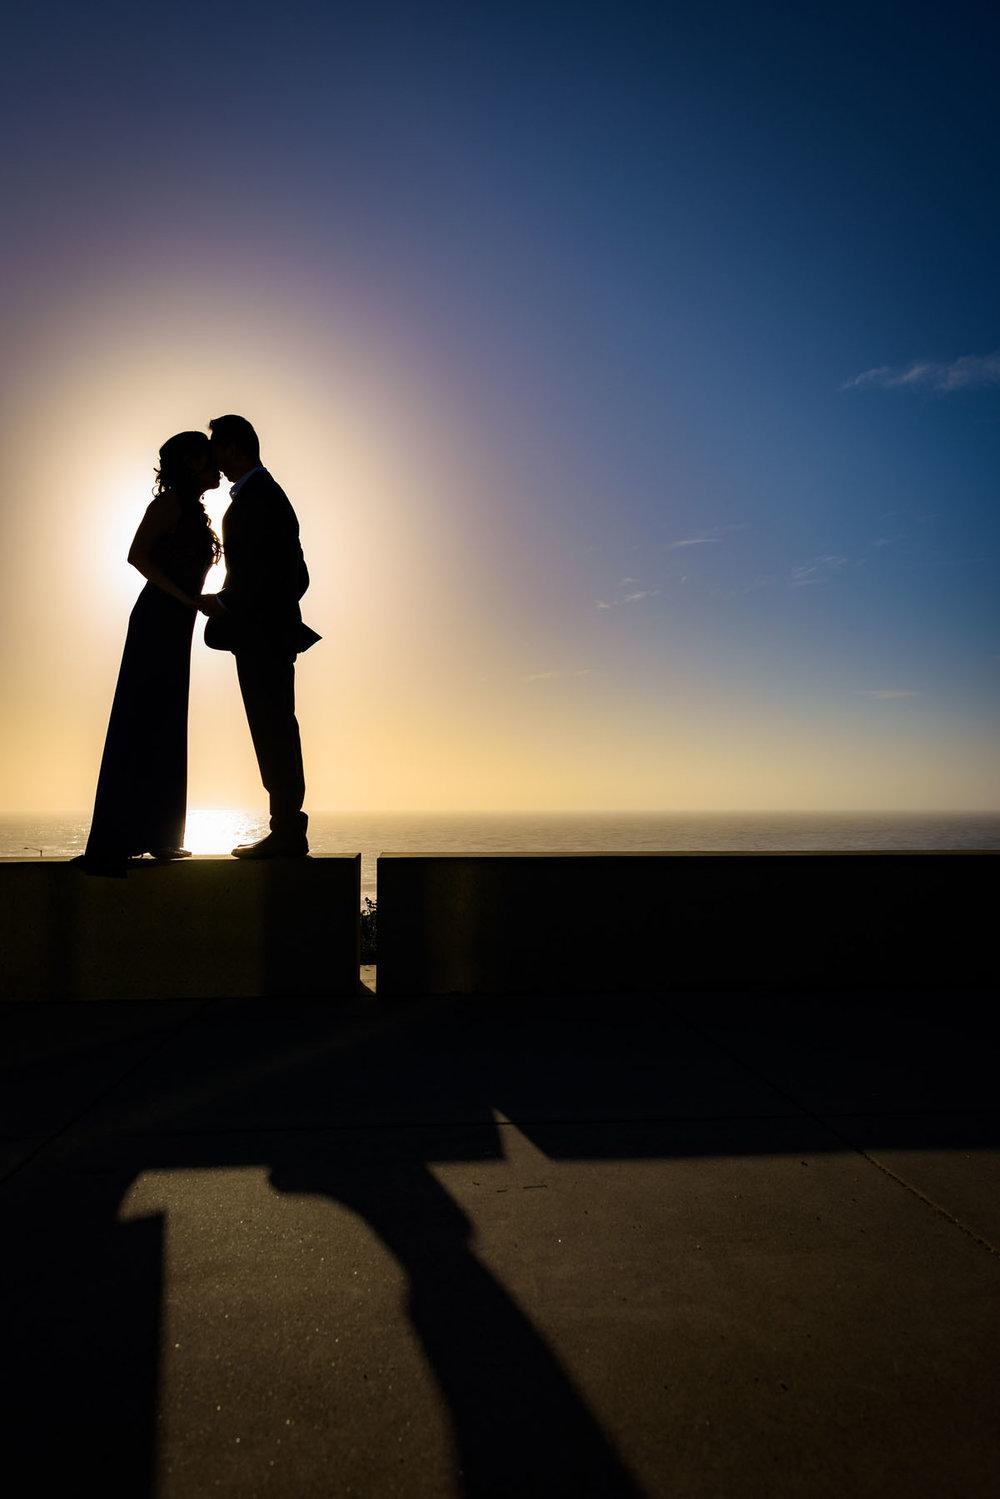 5976_Amanda_and_David_San_Francisco_Engagement_Photography_Legion_of_Honor_Sutro_Baths_Baker_Beach.jpg